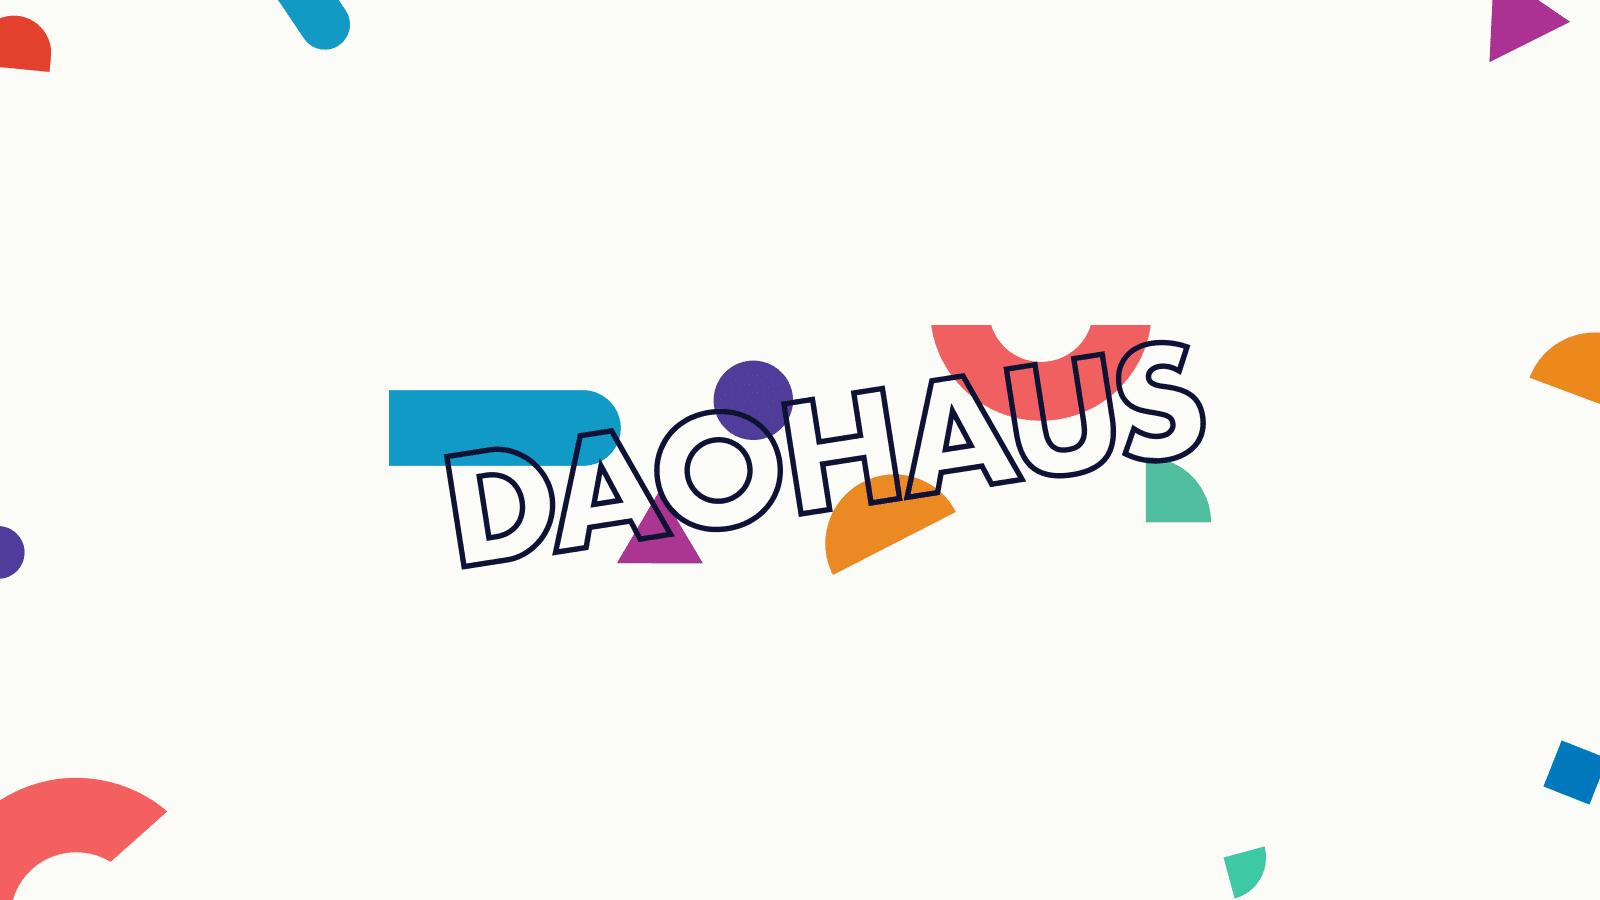 DAOHAUS